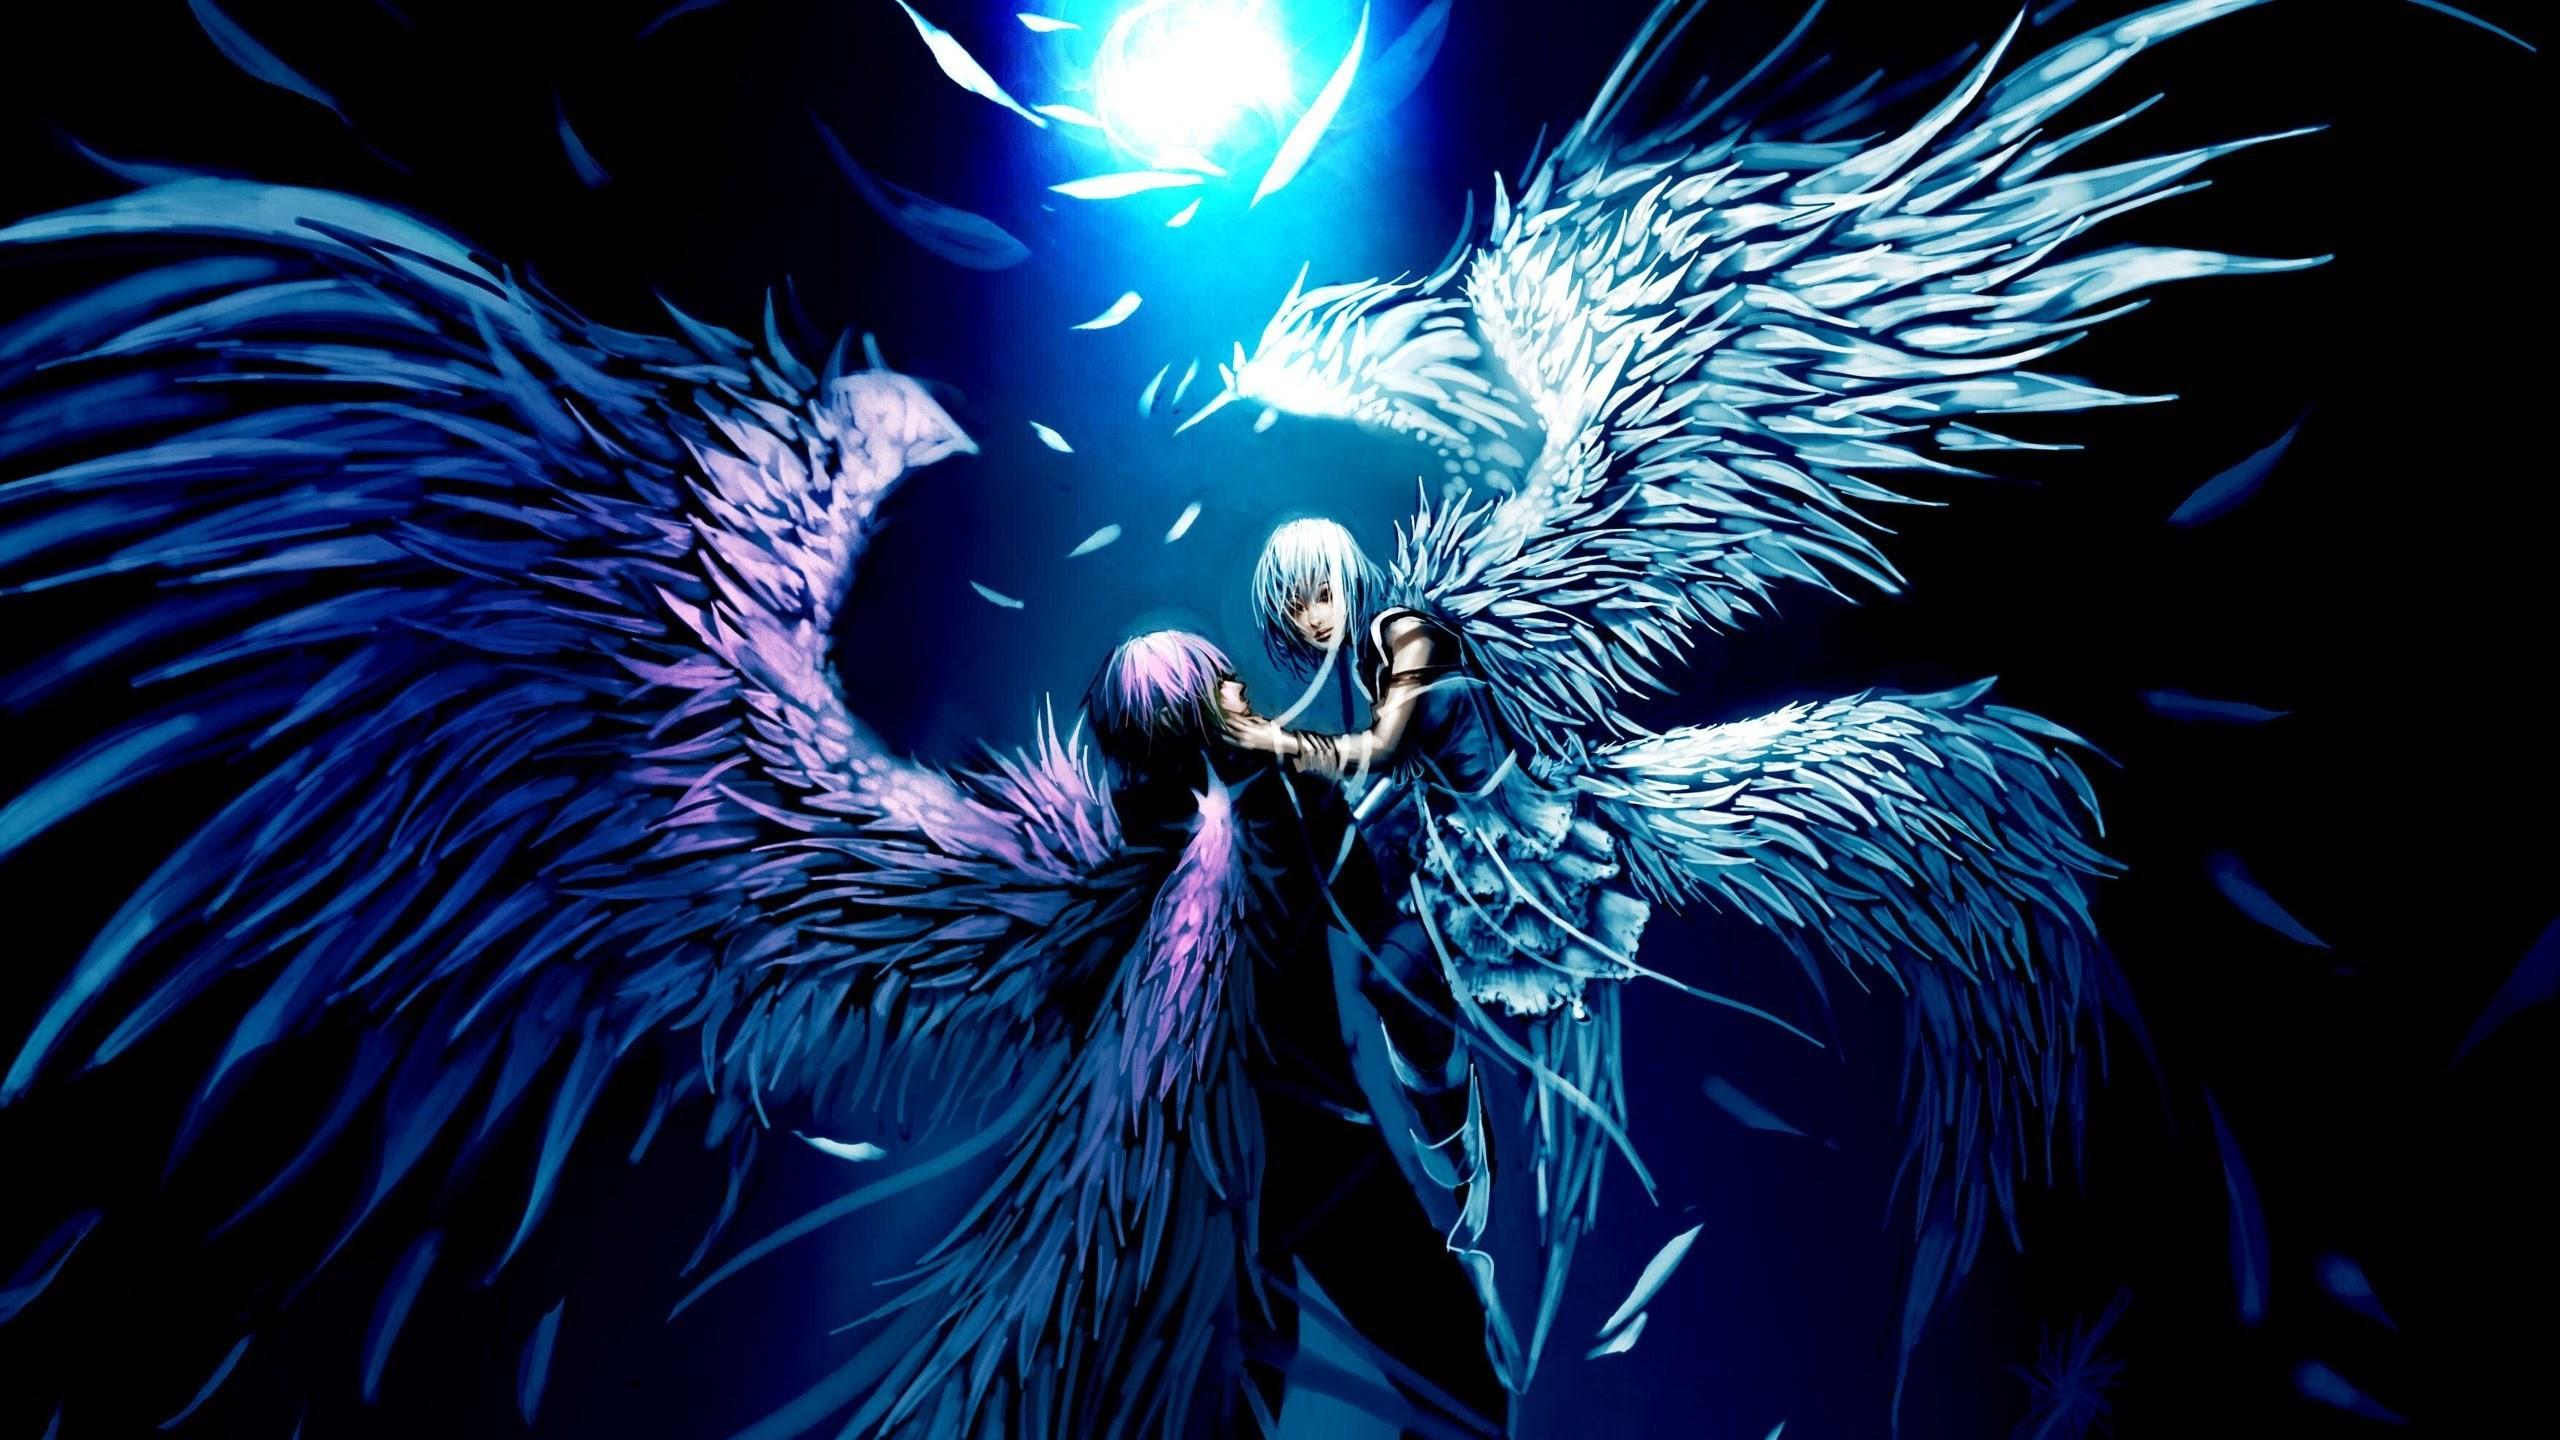 47 Anime Wallpaper And Screensavers